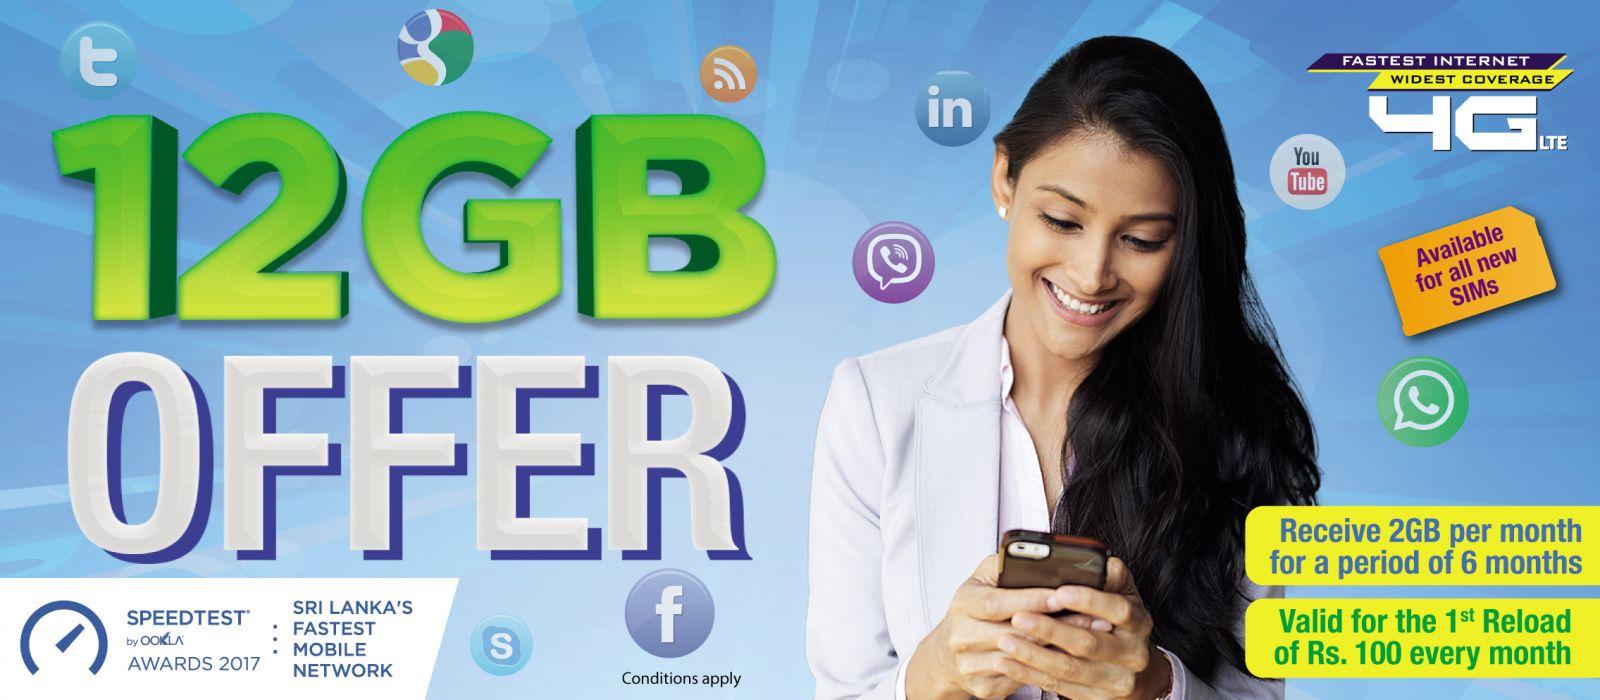 12GB SIM Pack Offer | Mobitel